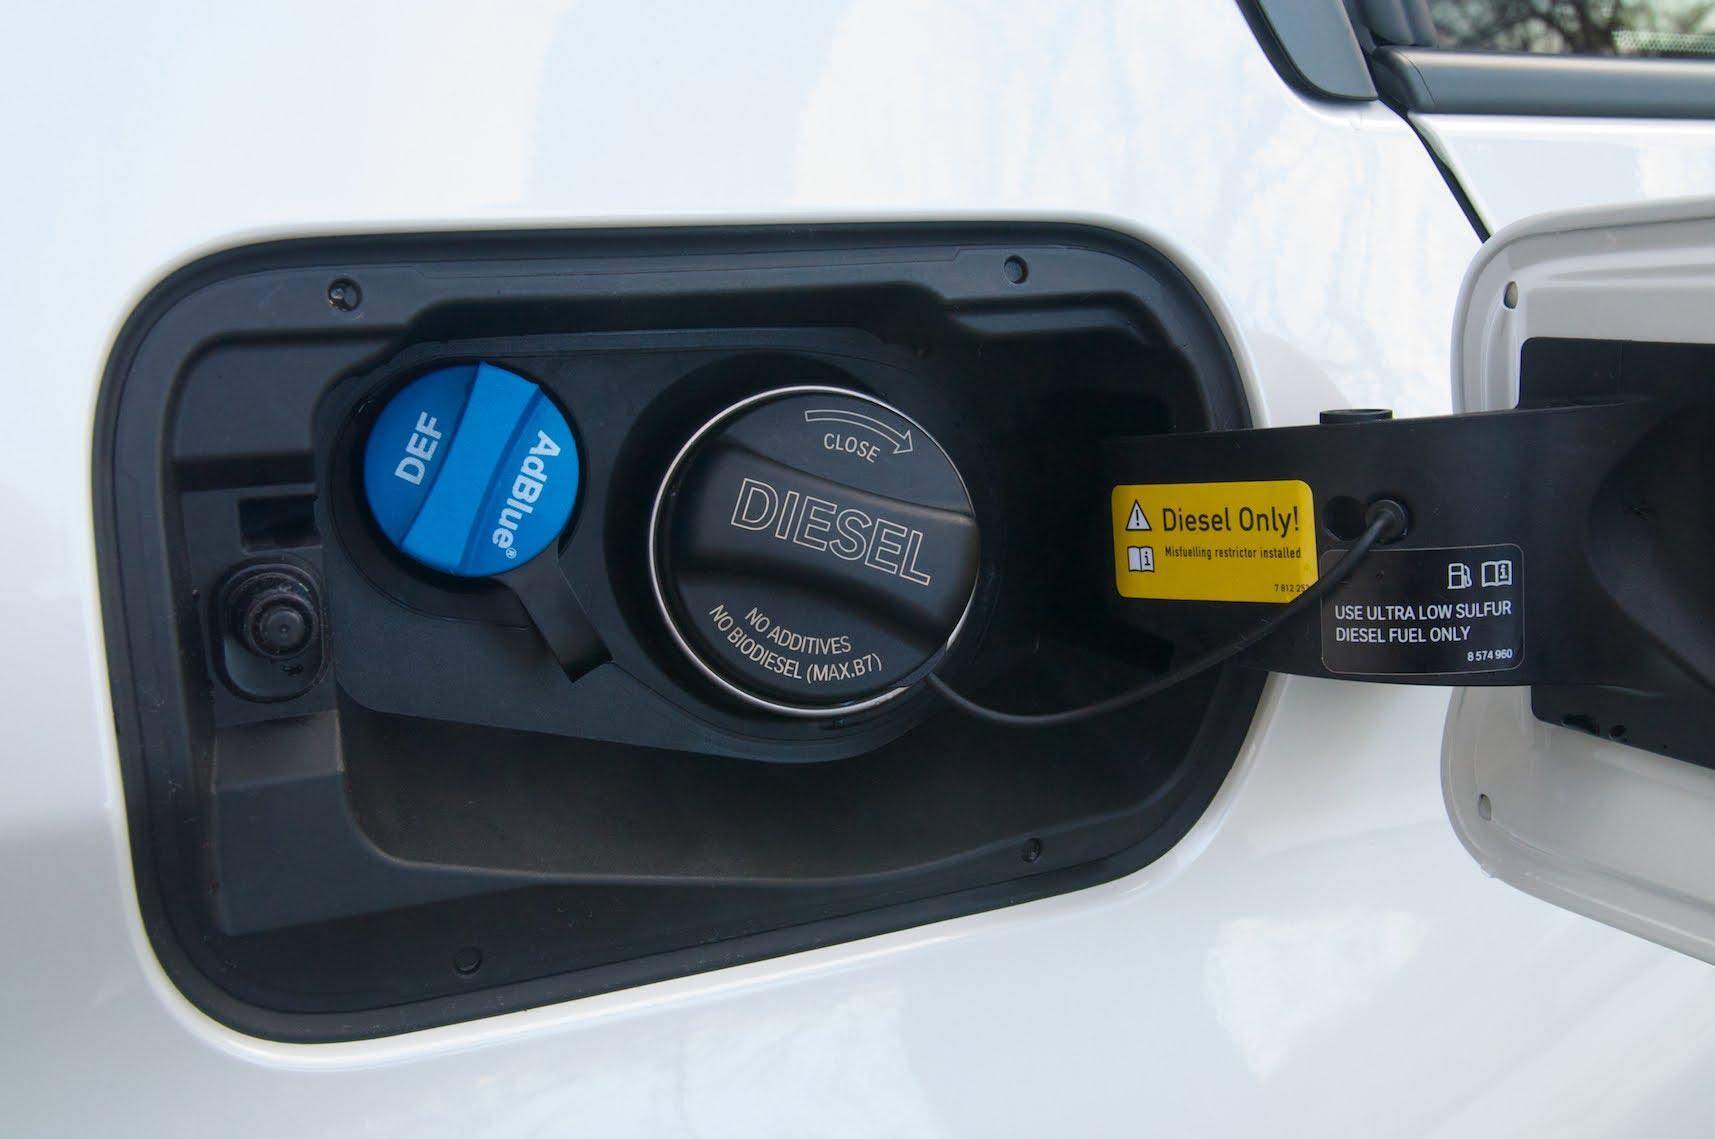 Bmw X3 Diesel Also Caught Up European Emissions Scandal